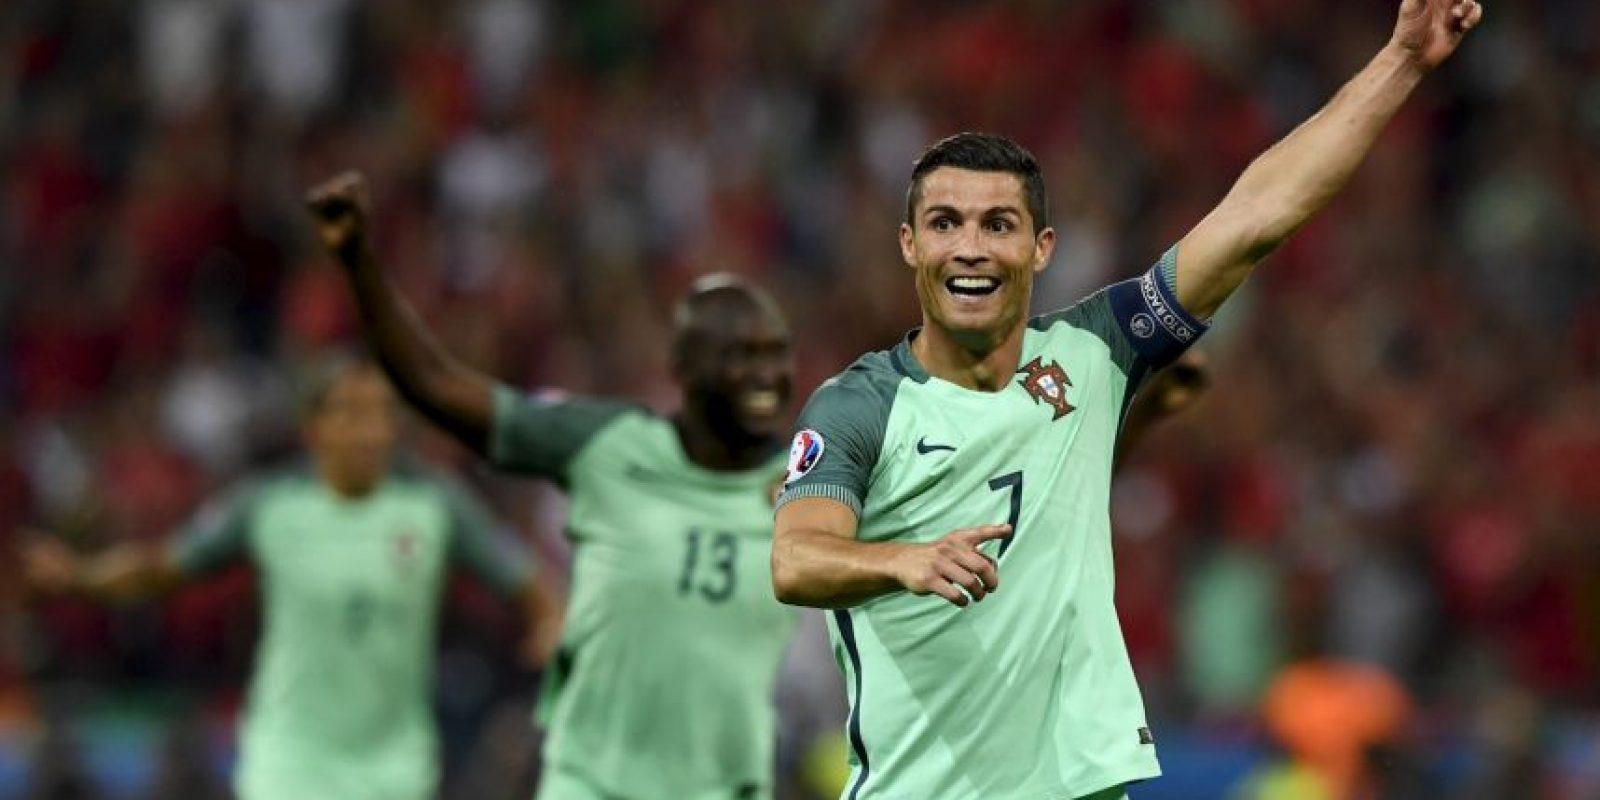 Portugal avanzó a semifinales tras vencer a Gales Foto:Getty Images. Imagen Por: